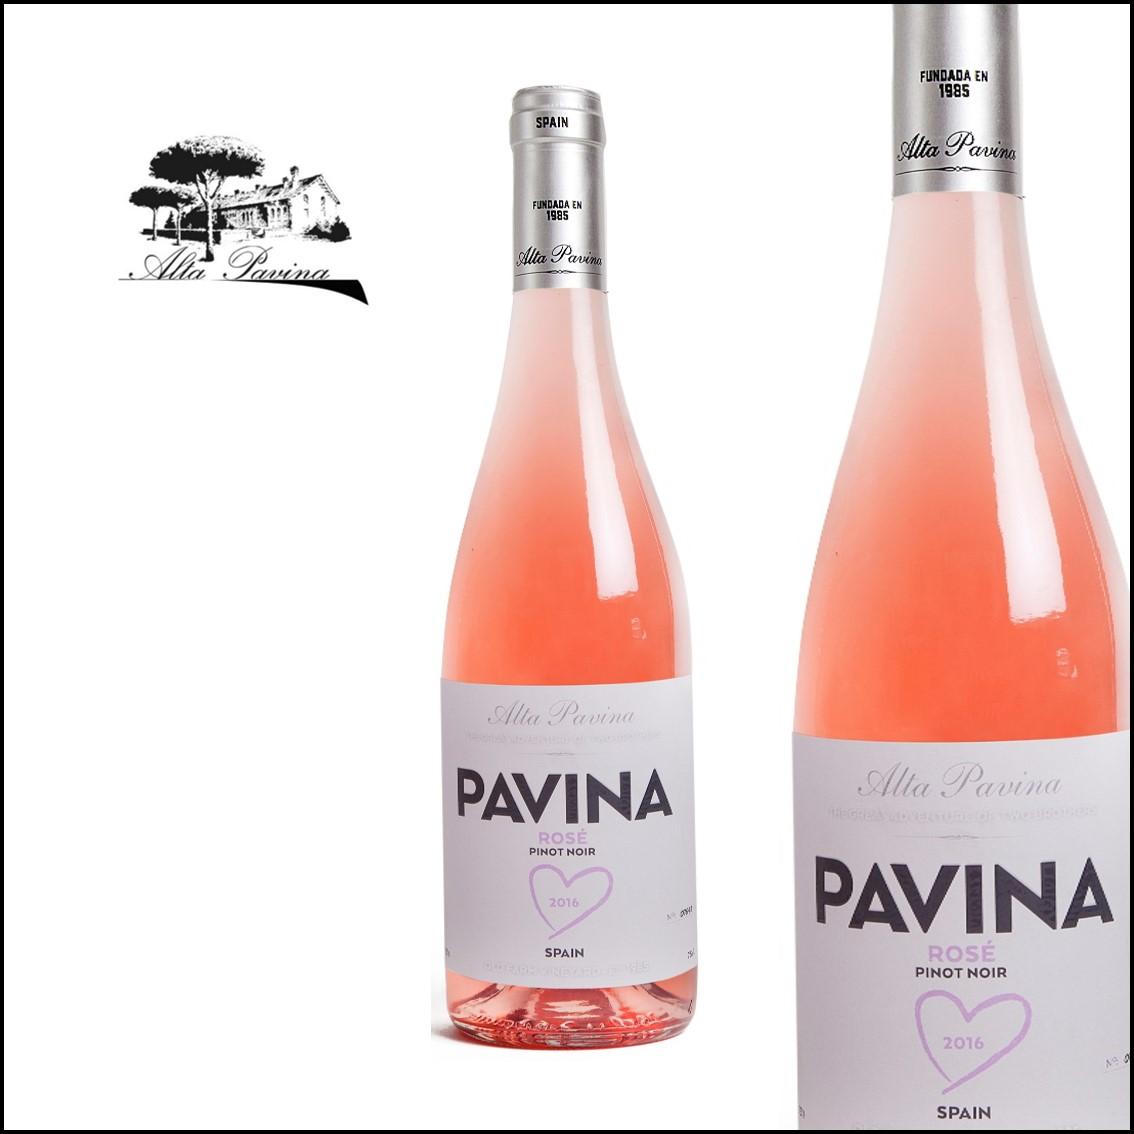 Alta Pavina «Pavina Rosé» Pinot Noir 100%